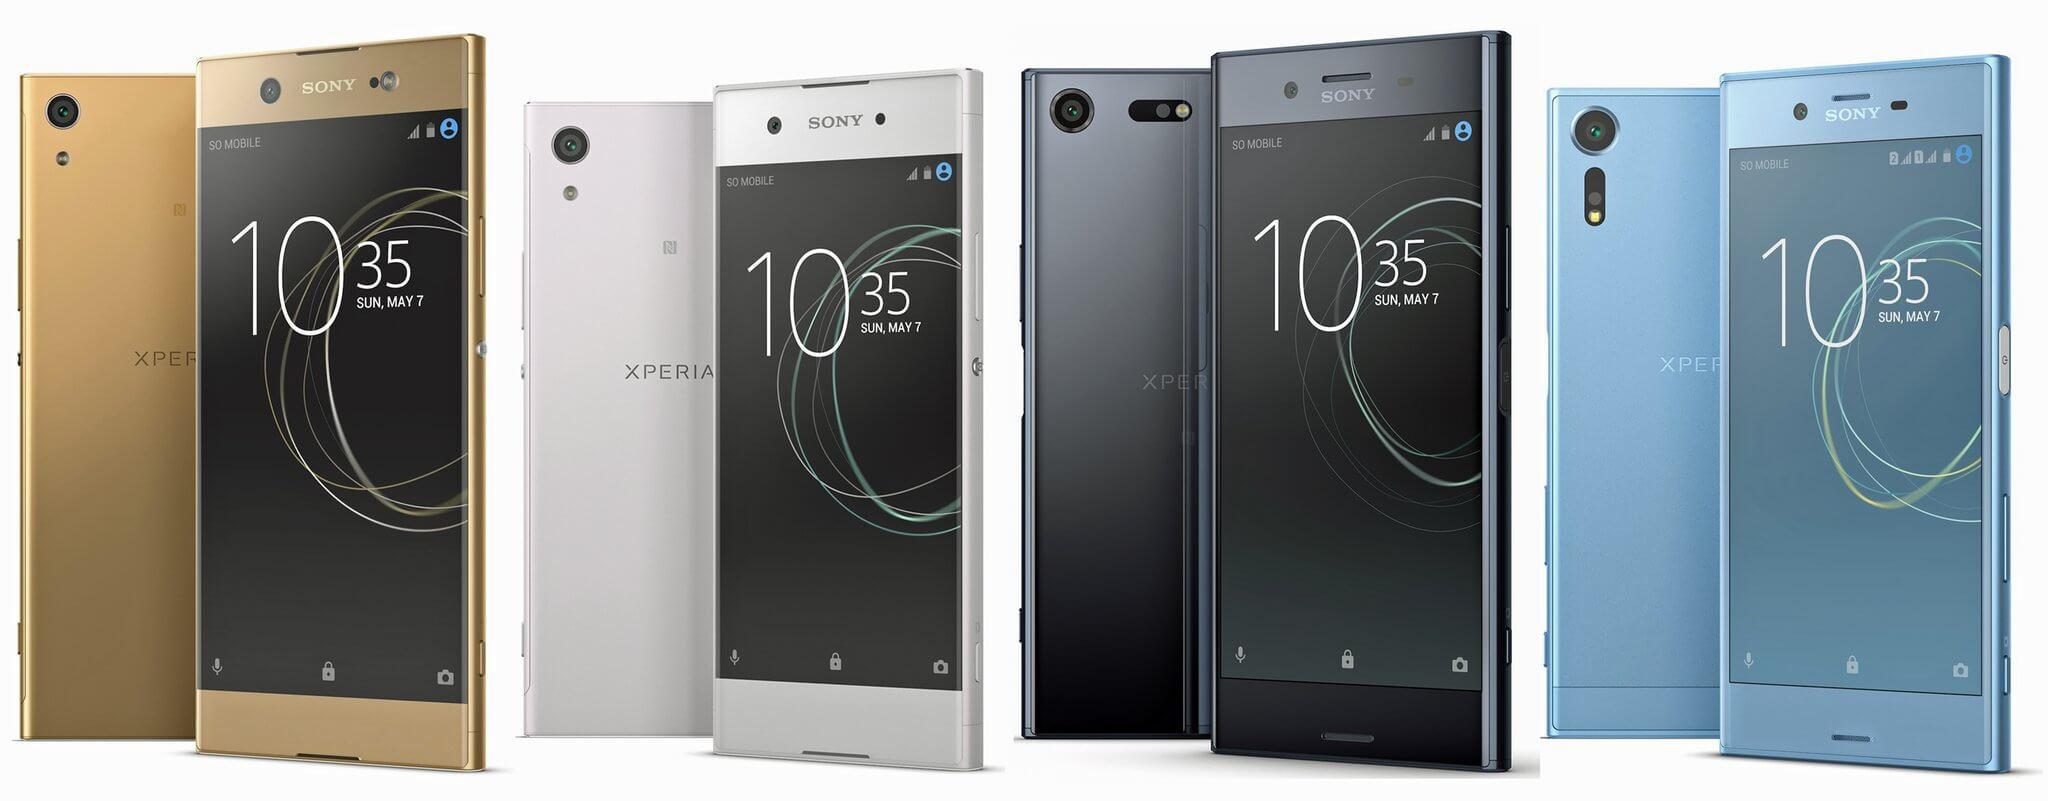 Sony-Xperia-2017